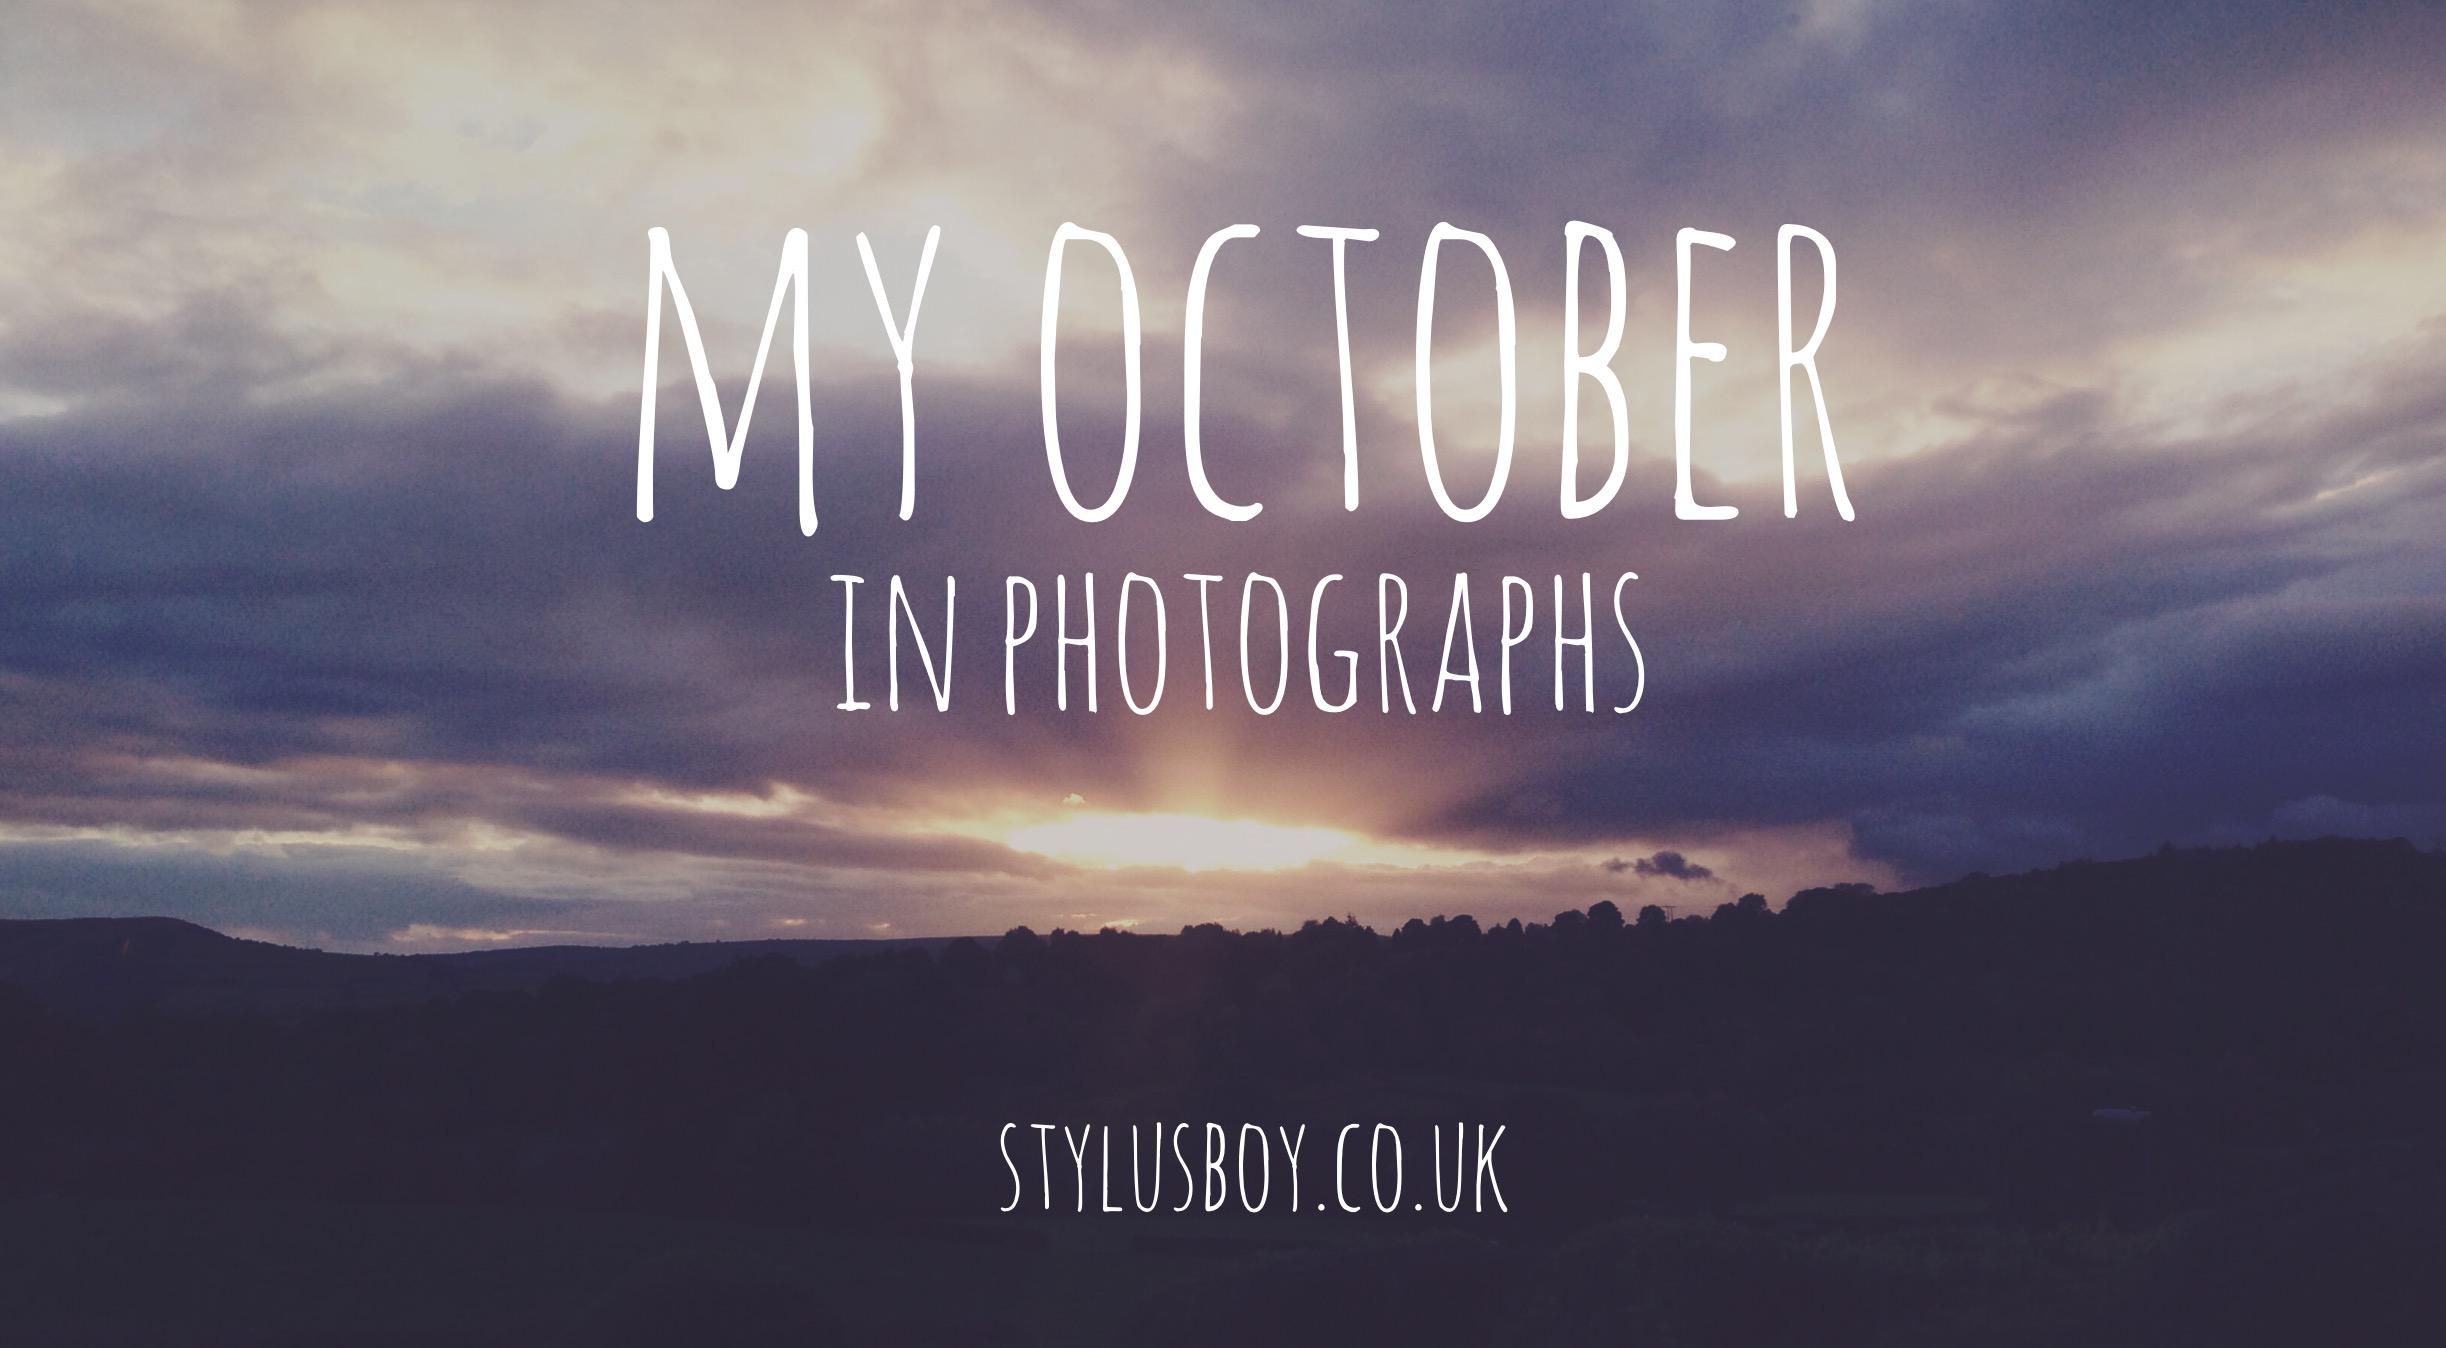 stylusboy-october-photographs-2016-header